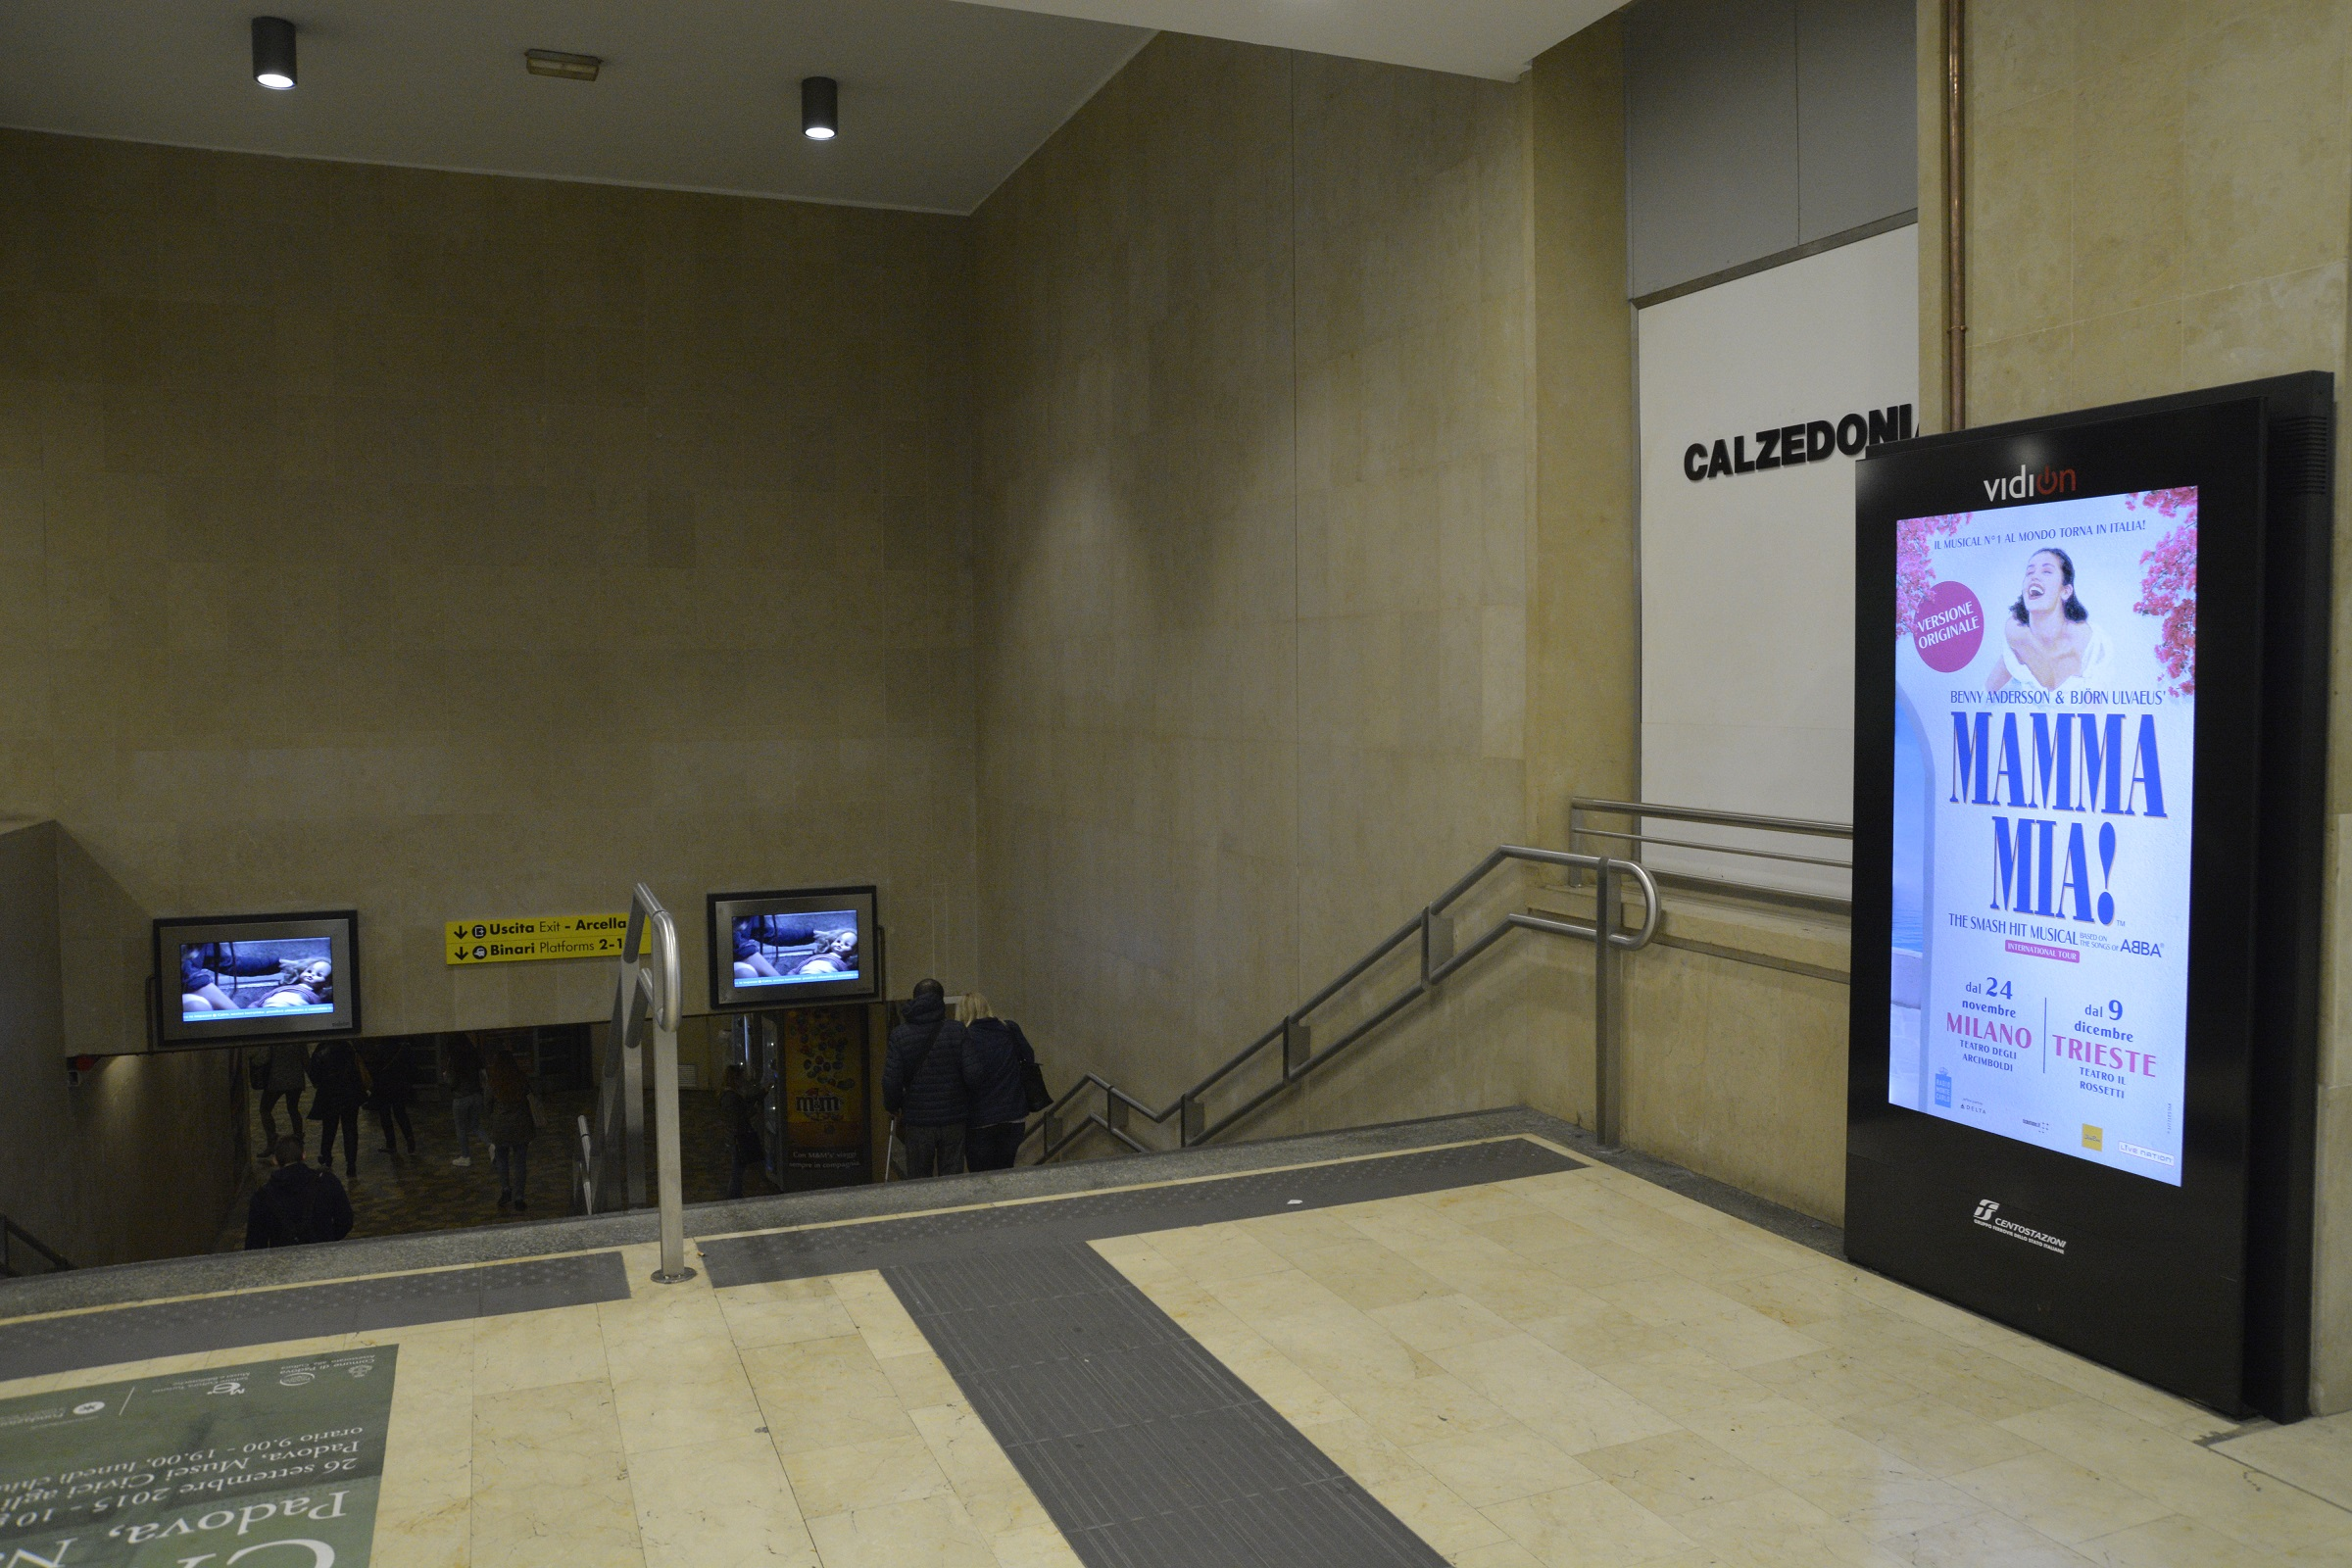 Digital display use in transportation